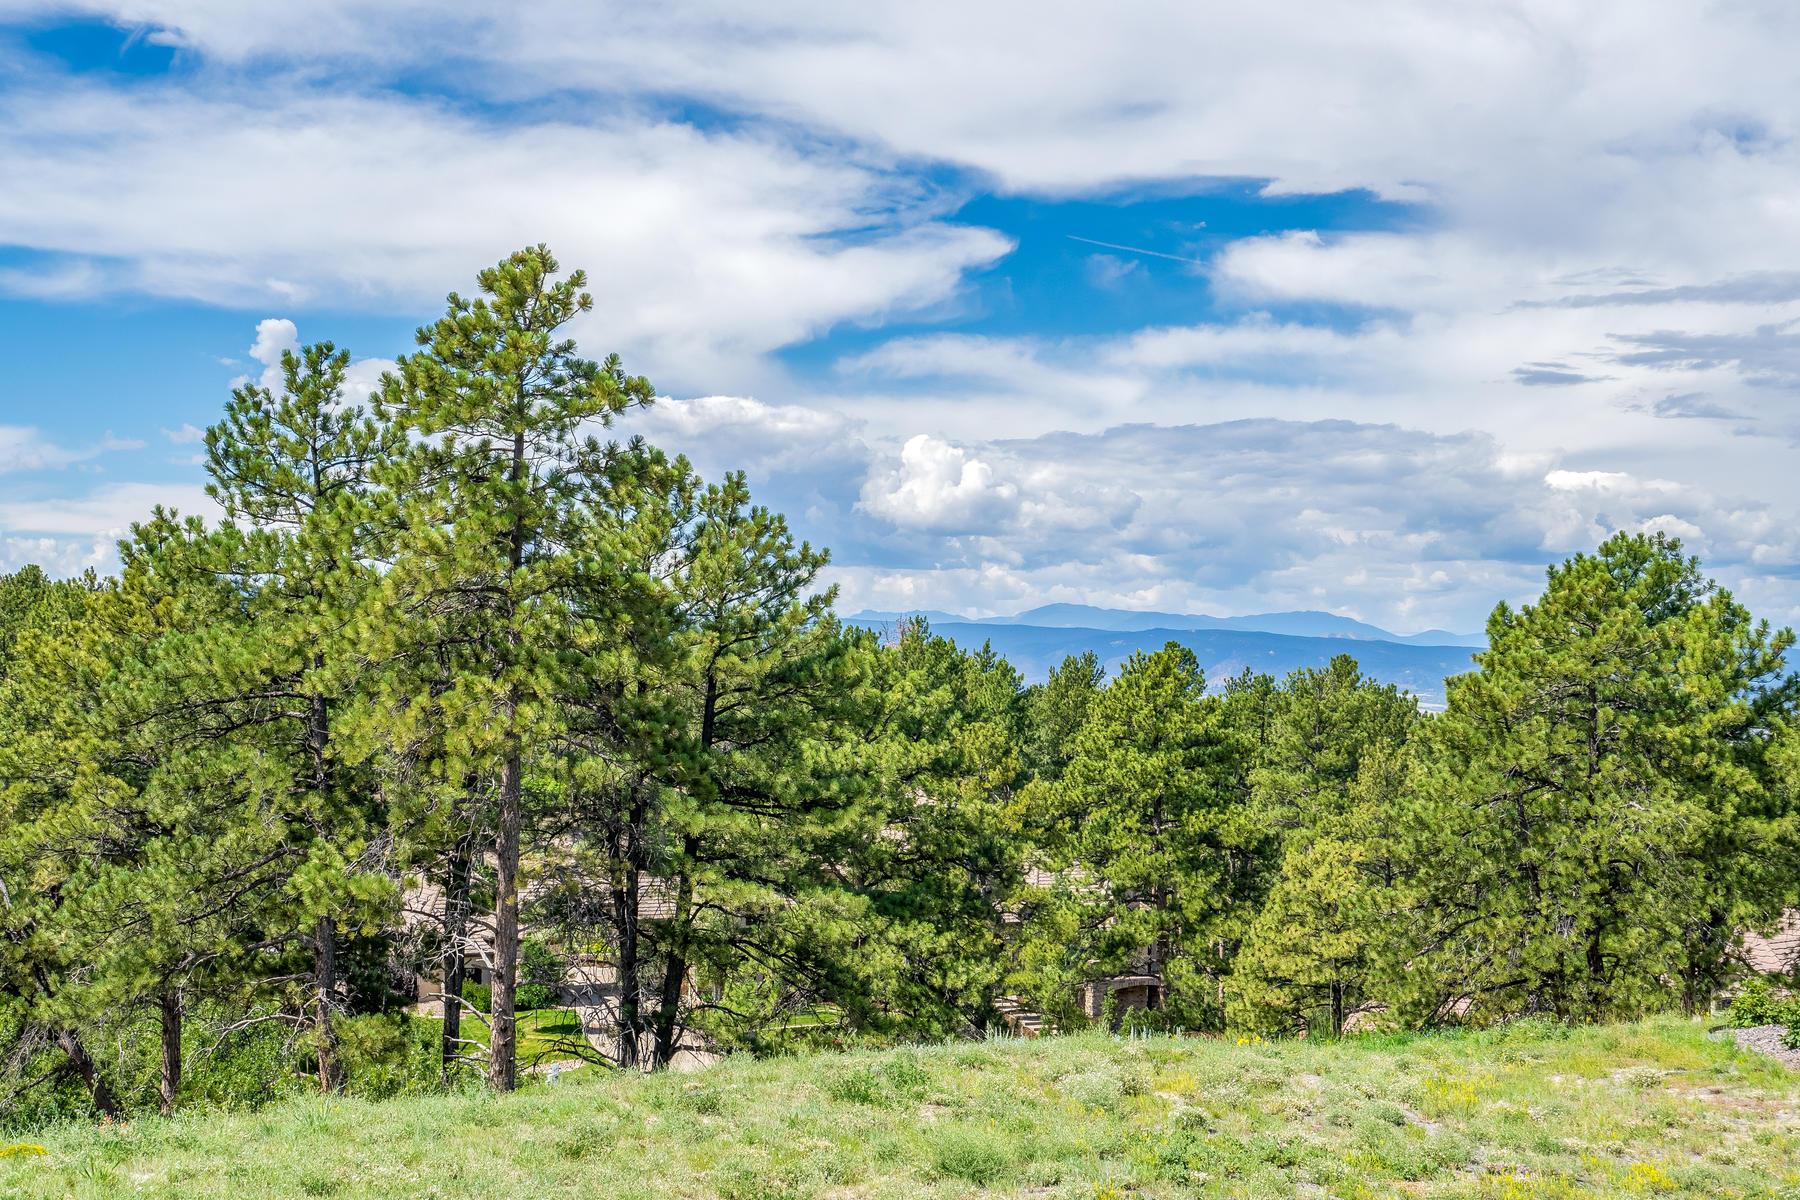 Property for Active at Avenida Del Sol Lot 1839 Avenida Del Sol Castle Rock, Colorado 80104 United States